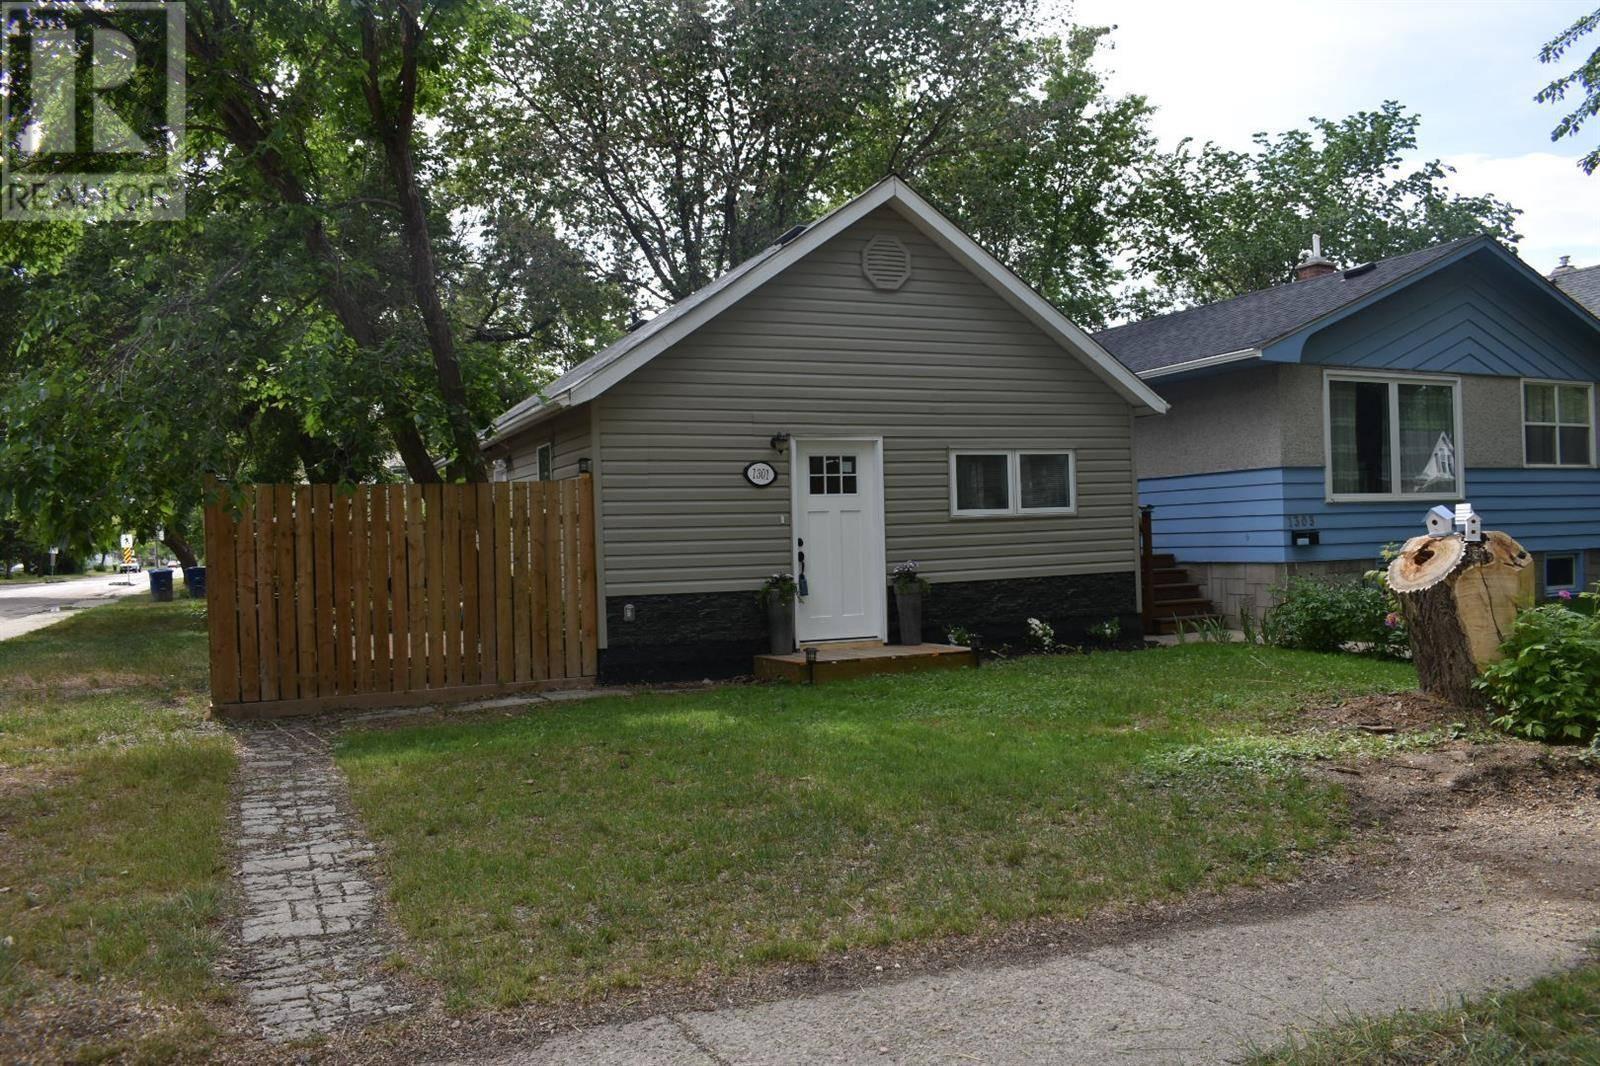 House for sale at 1301 D Ave N Saskatoon Saskatchewan - MLS: SK777429